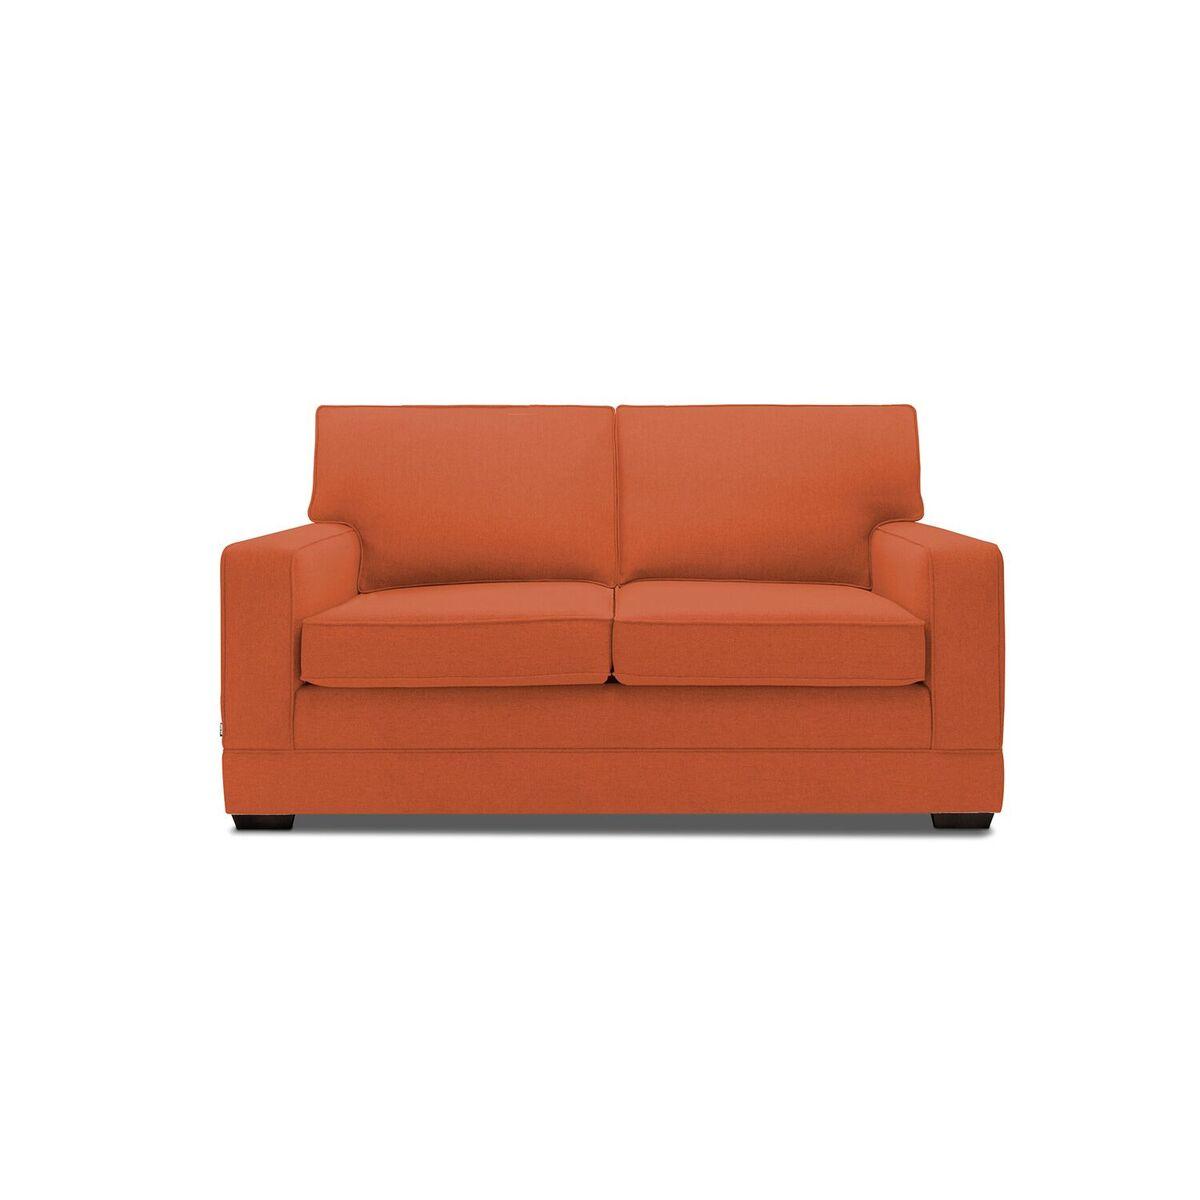 Modern Pocket Sofa Bed Terracotta